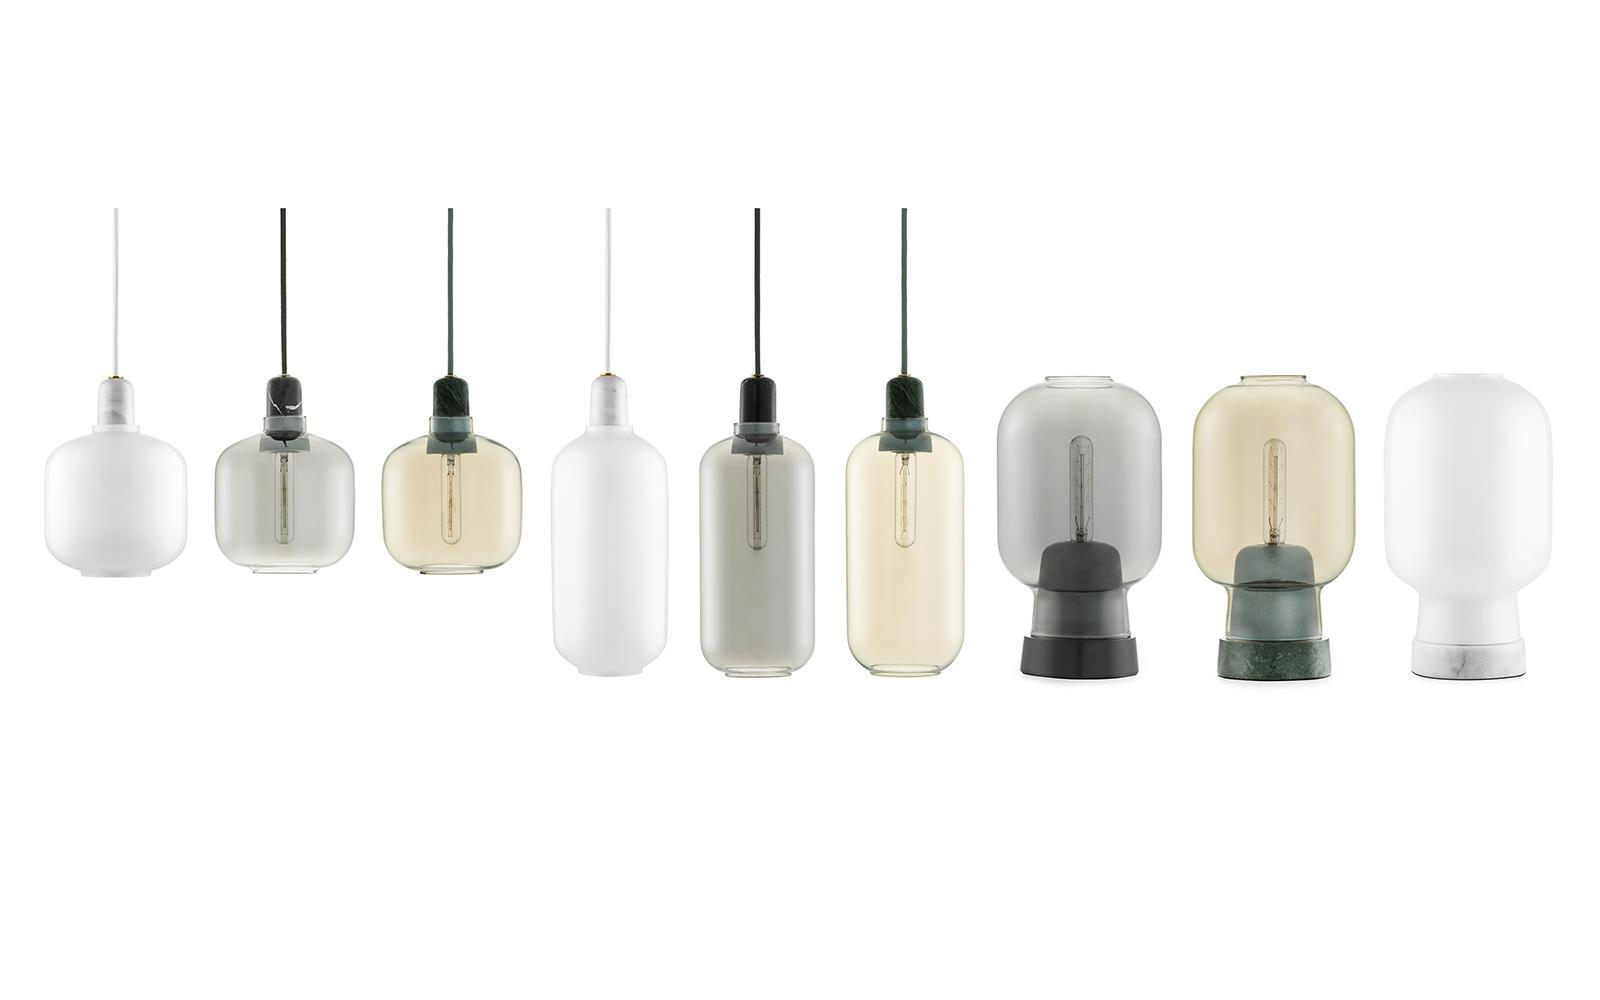 Amp table lamp white/white